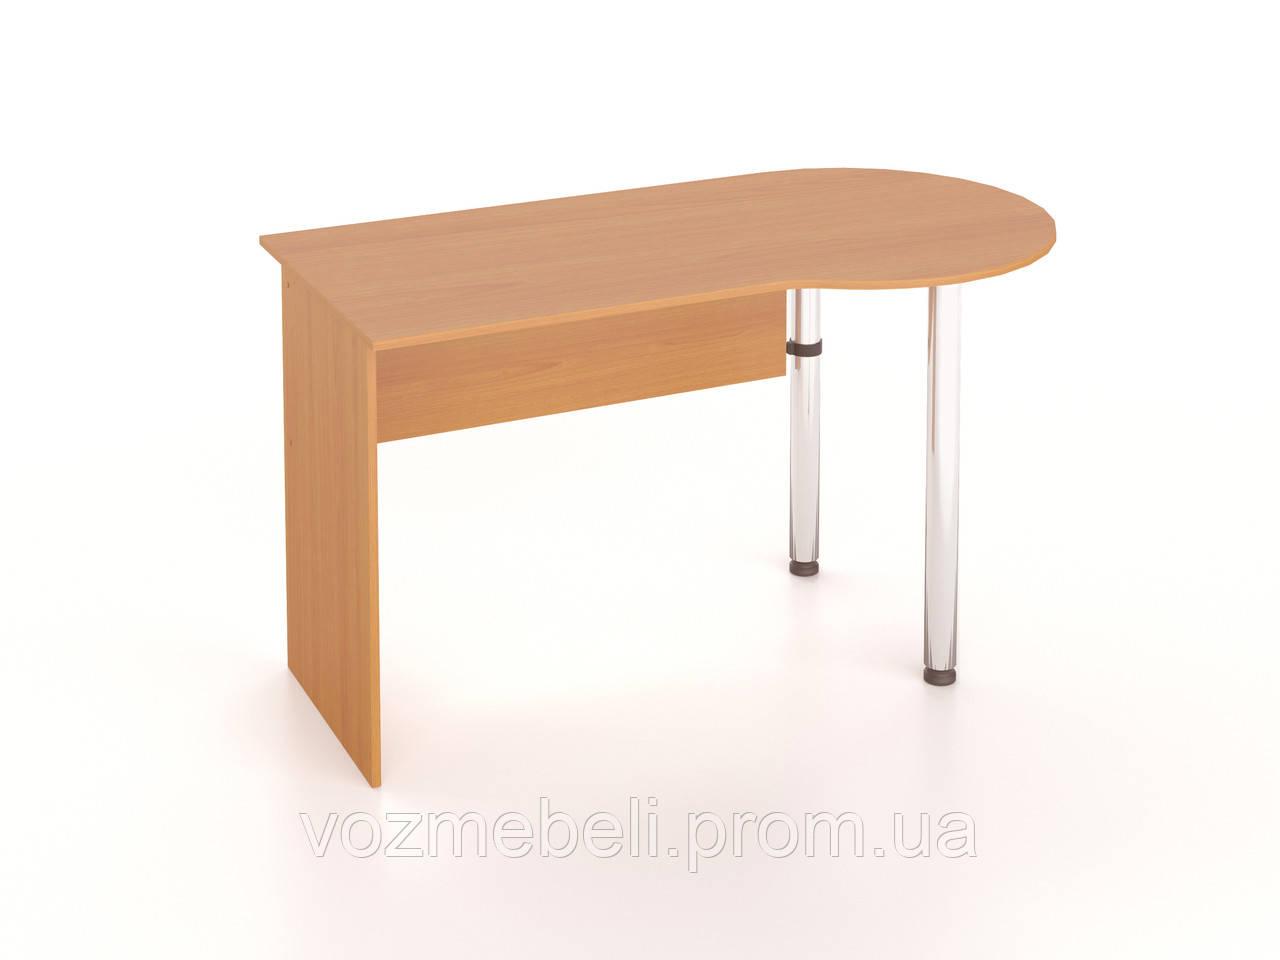 Арт стіл СТ-201